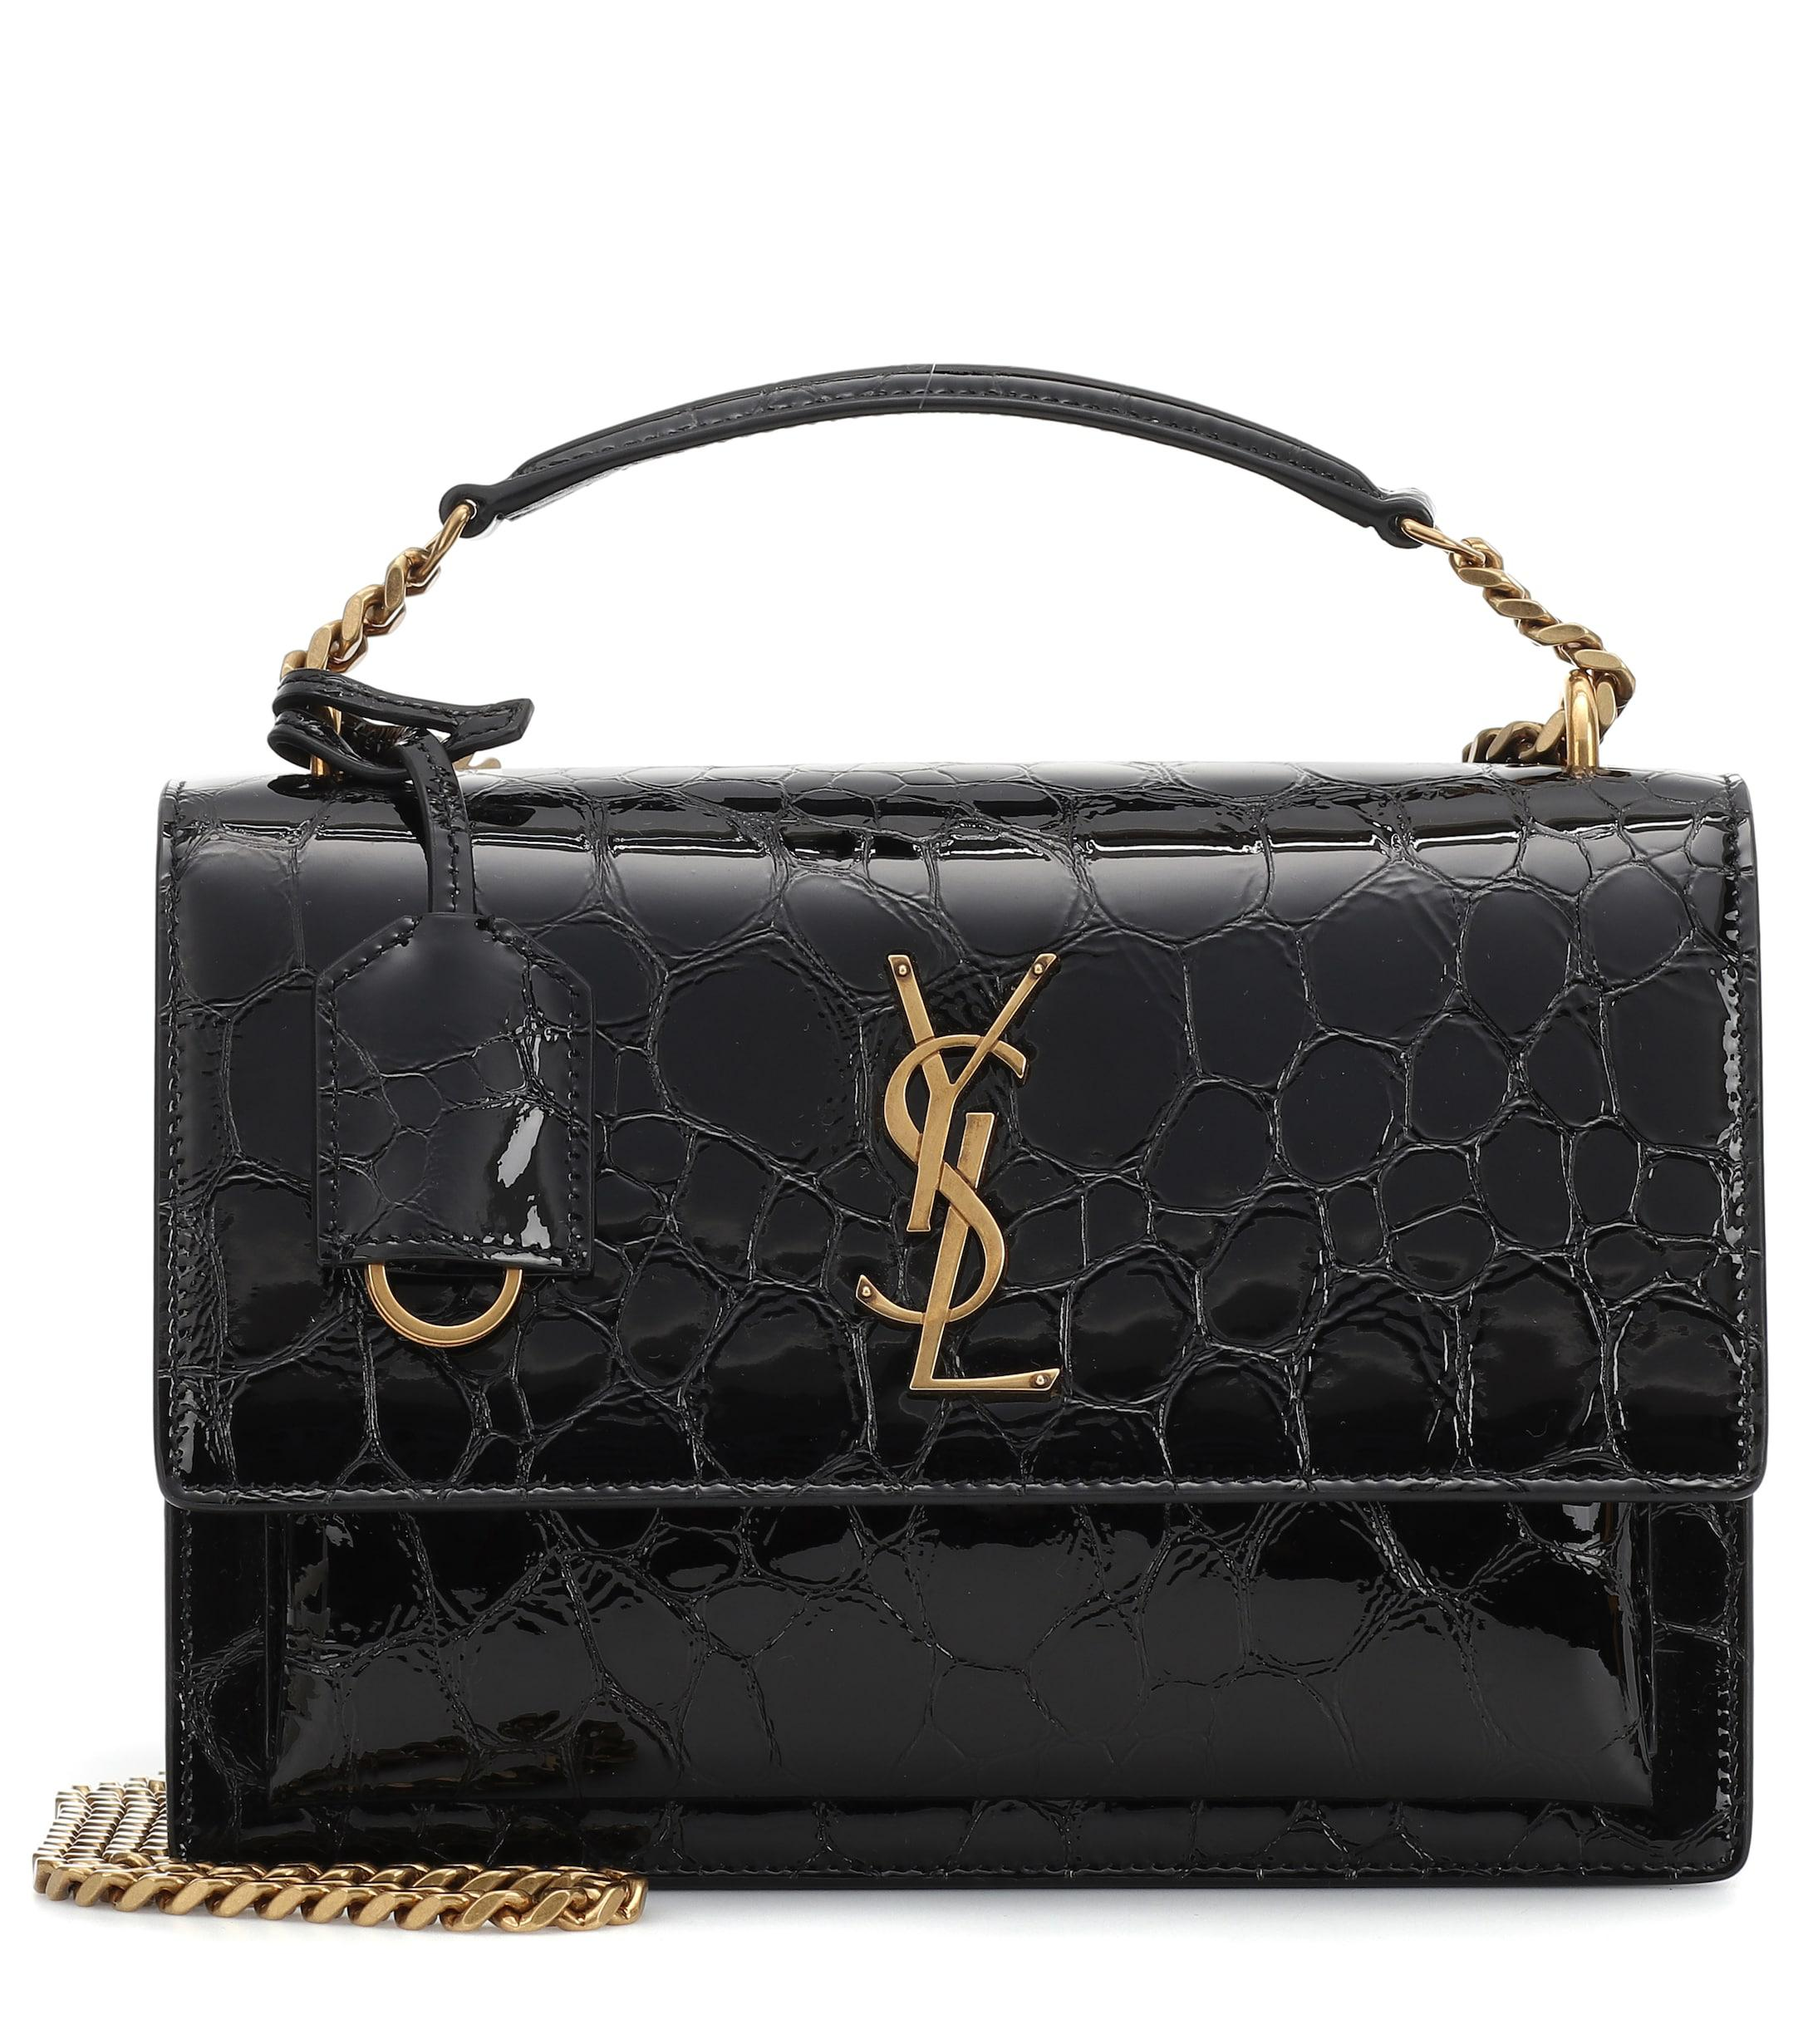 4b25dc578a Lyst - Saint Laurent Medium Sunset Monogram Shoulder Bag in Black